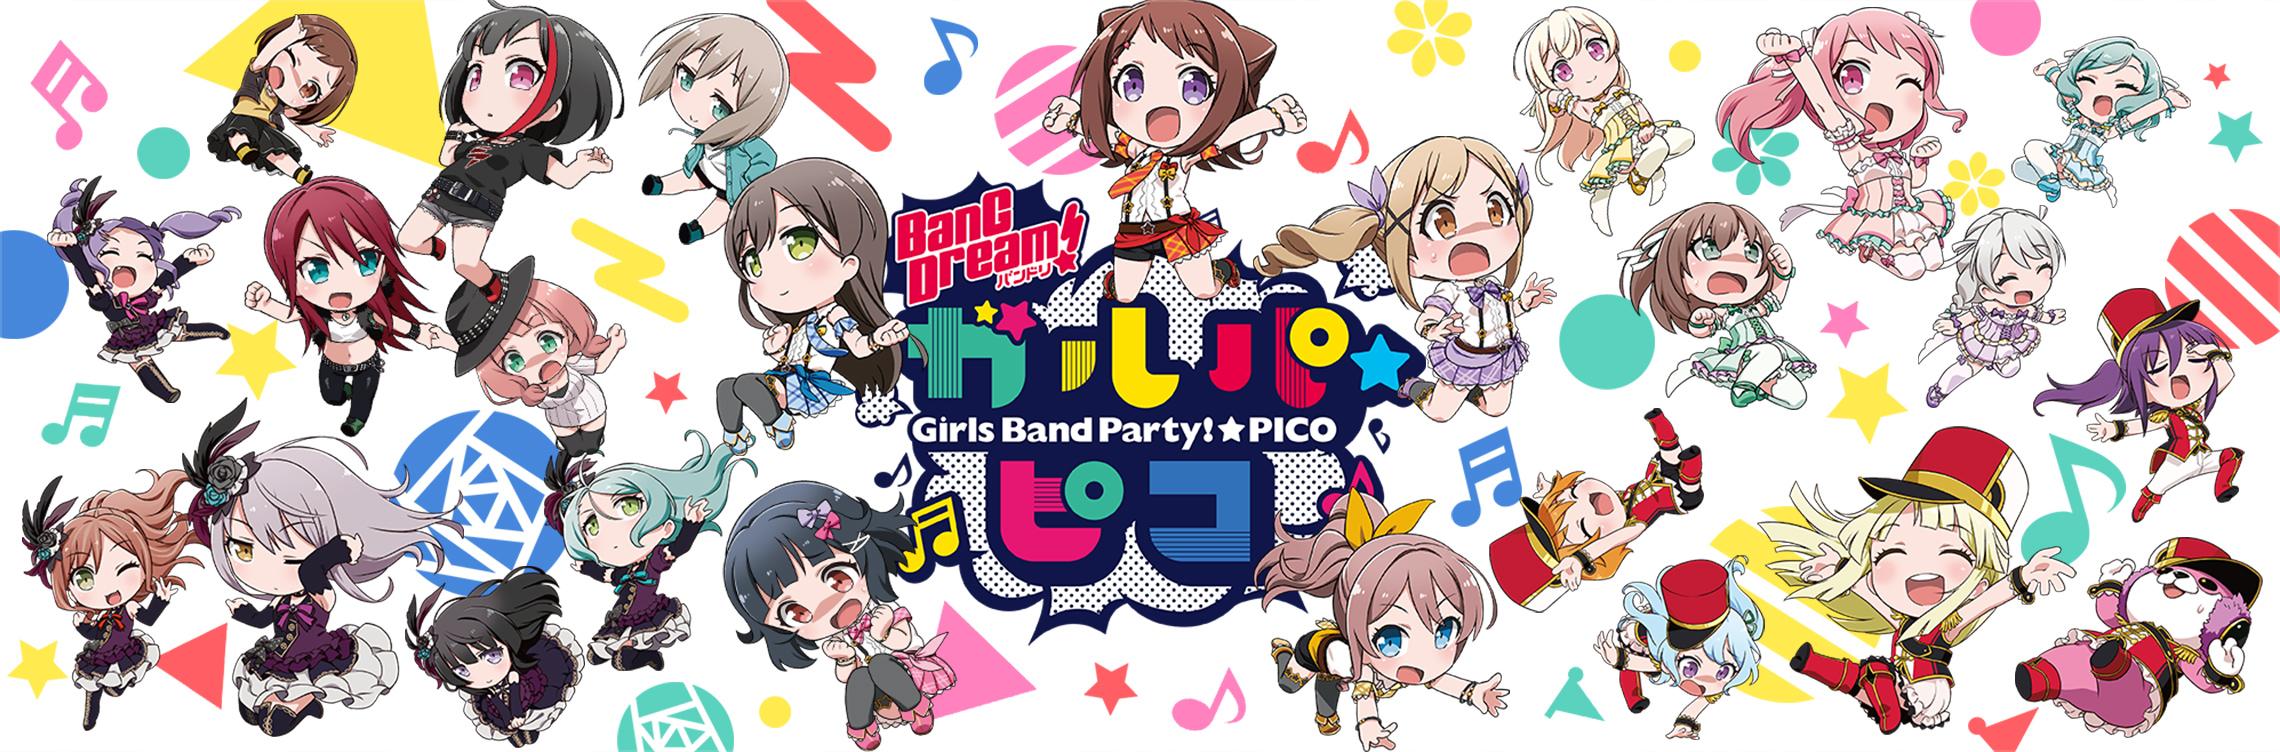 BanG Dream! Girls Band Party!☆PICO | Anime | BanG Dream! Official Website